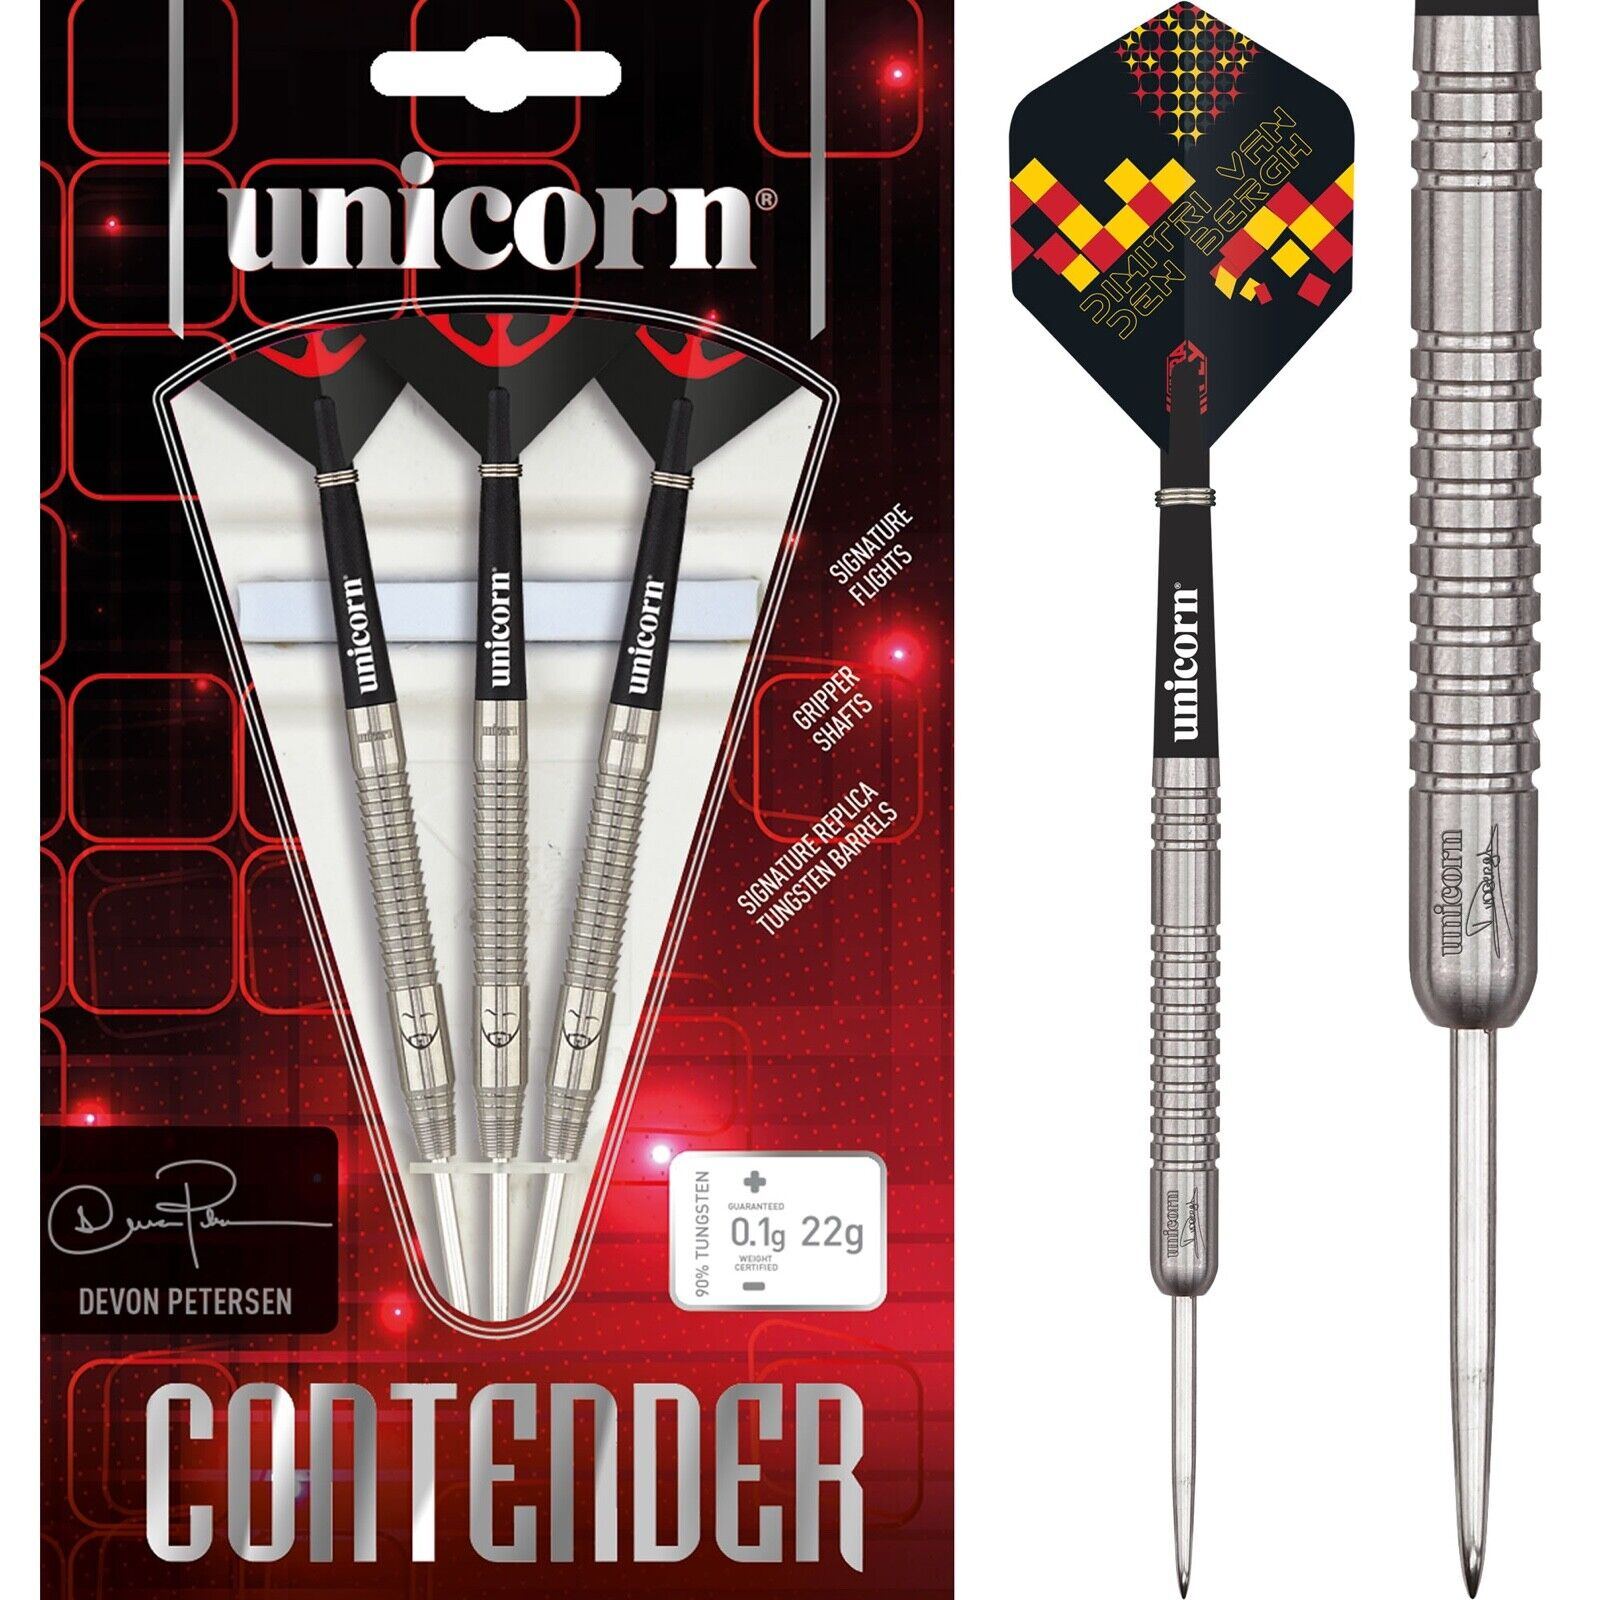 Unicorn Dimitri Van Den Bergh Dart Flights The Dream Maker 22g-24g Darts